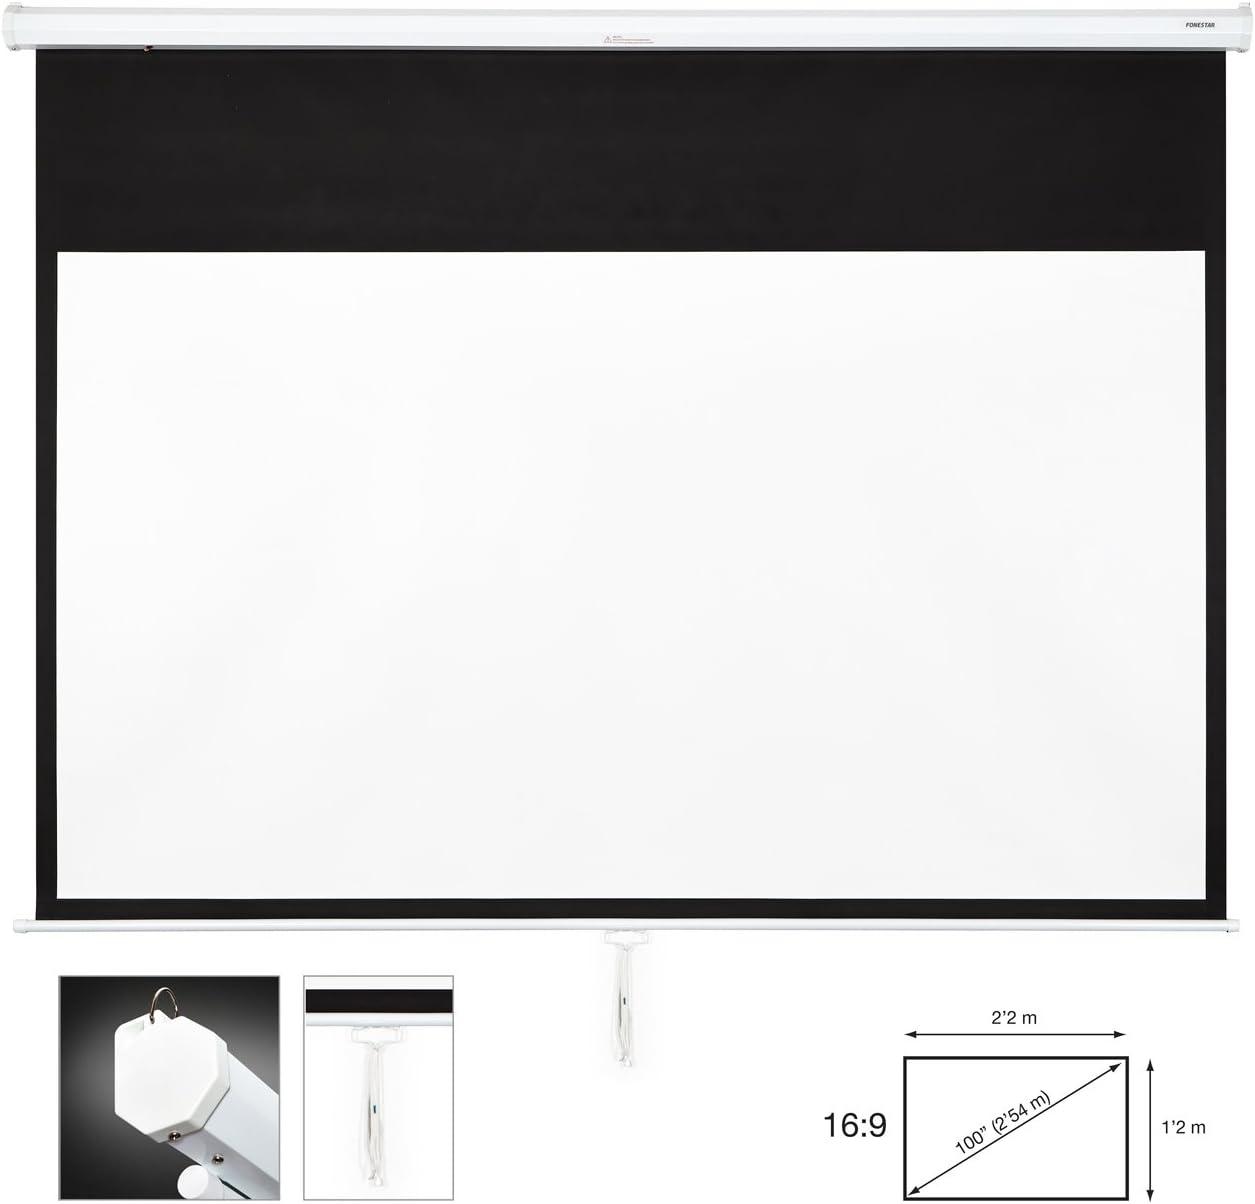 FONESTAR PPMA-16100-BA 2200 x 1200mm pizarrón Blanco - Accesorio ...